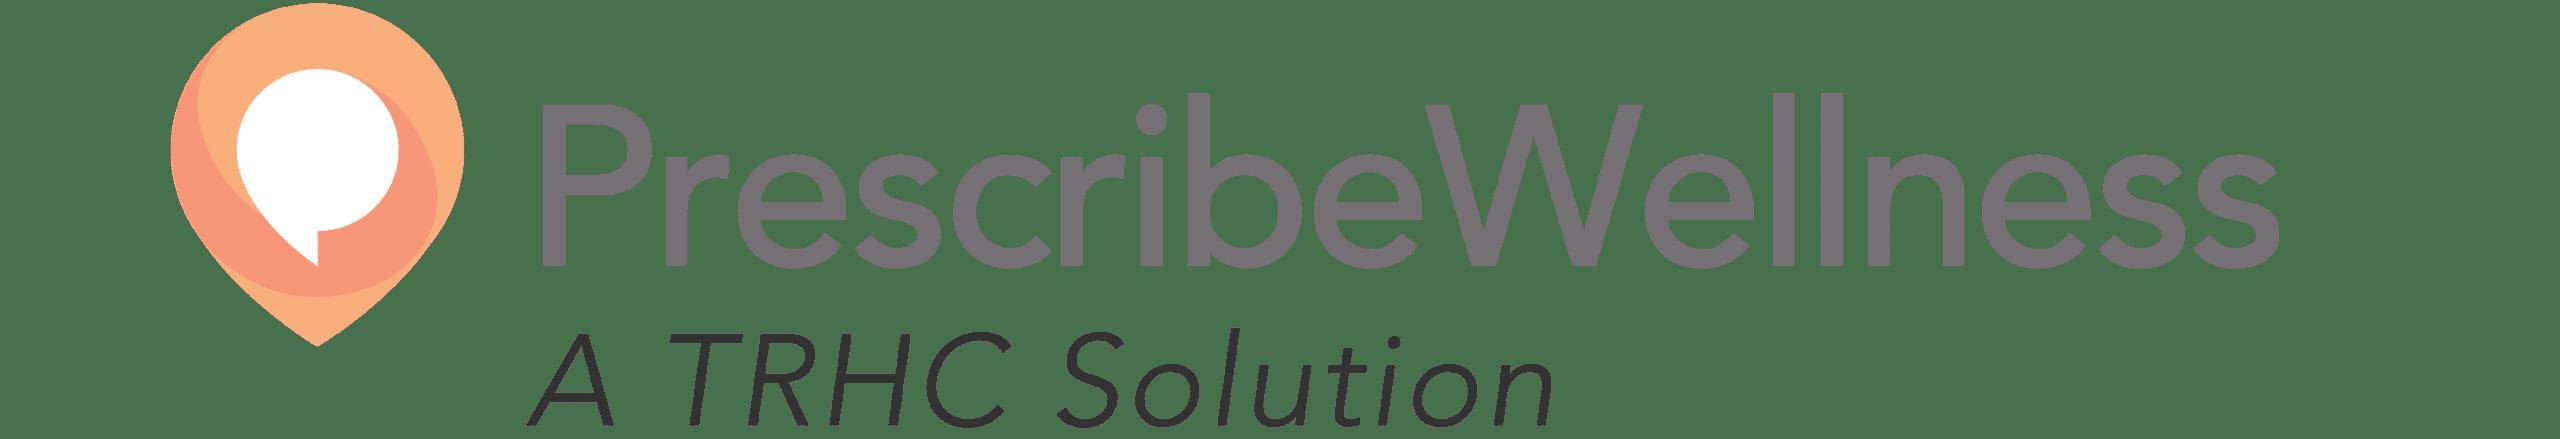 Blog | PrescribeWellness